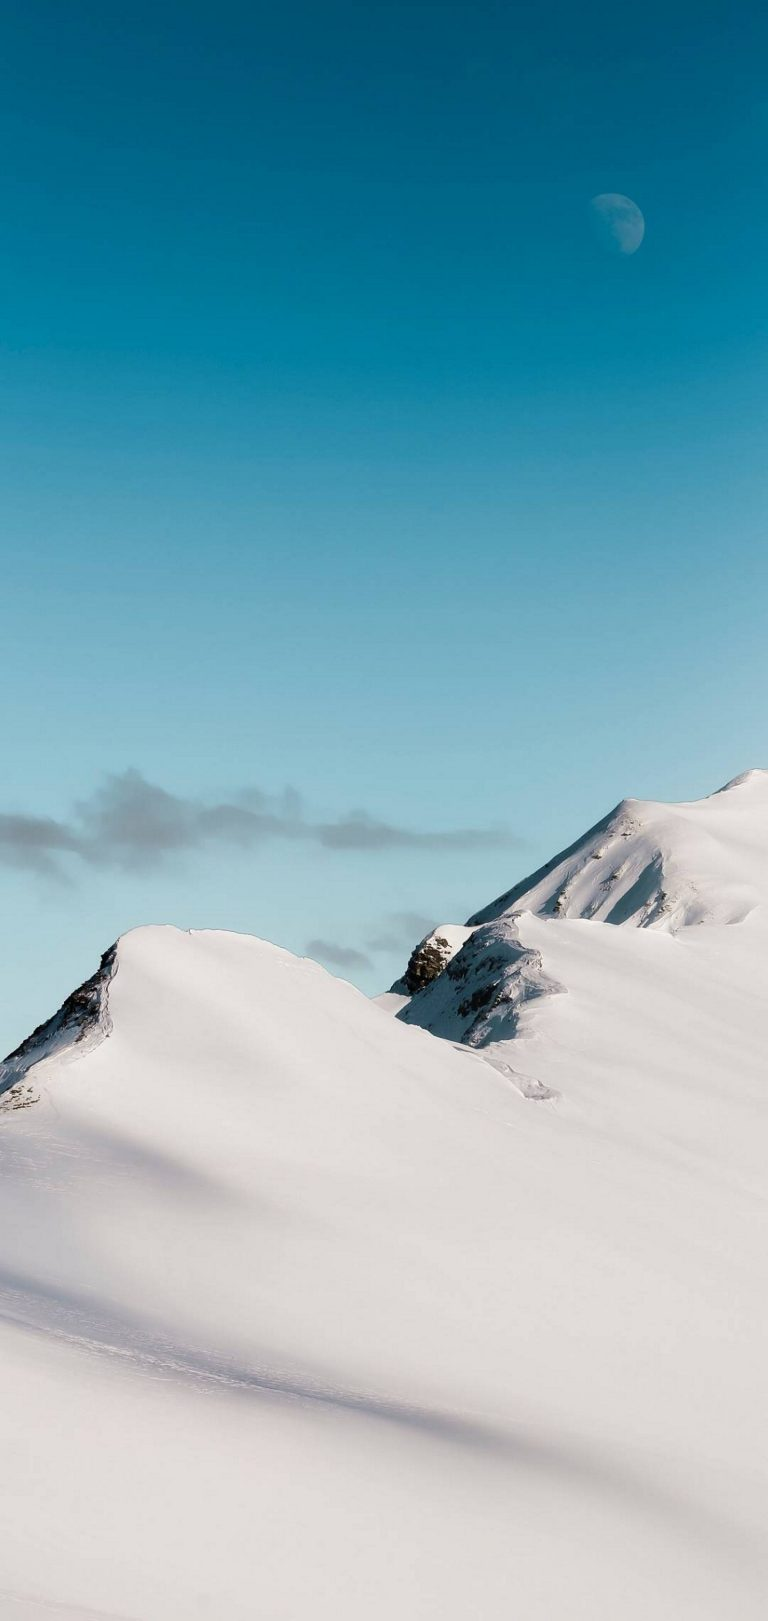 Top Mountain Cloud Minimalism Wallpaper 1440x3040 768x1621